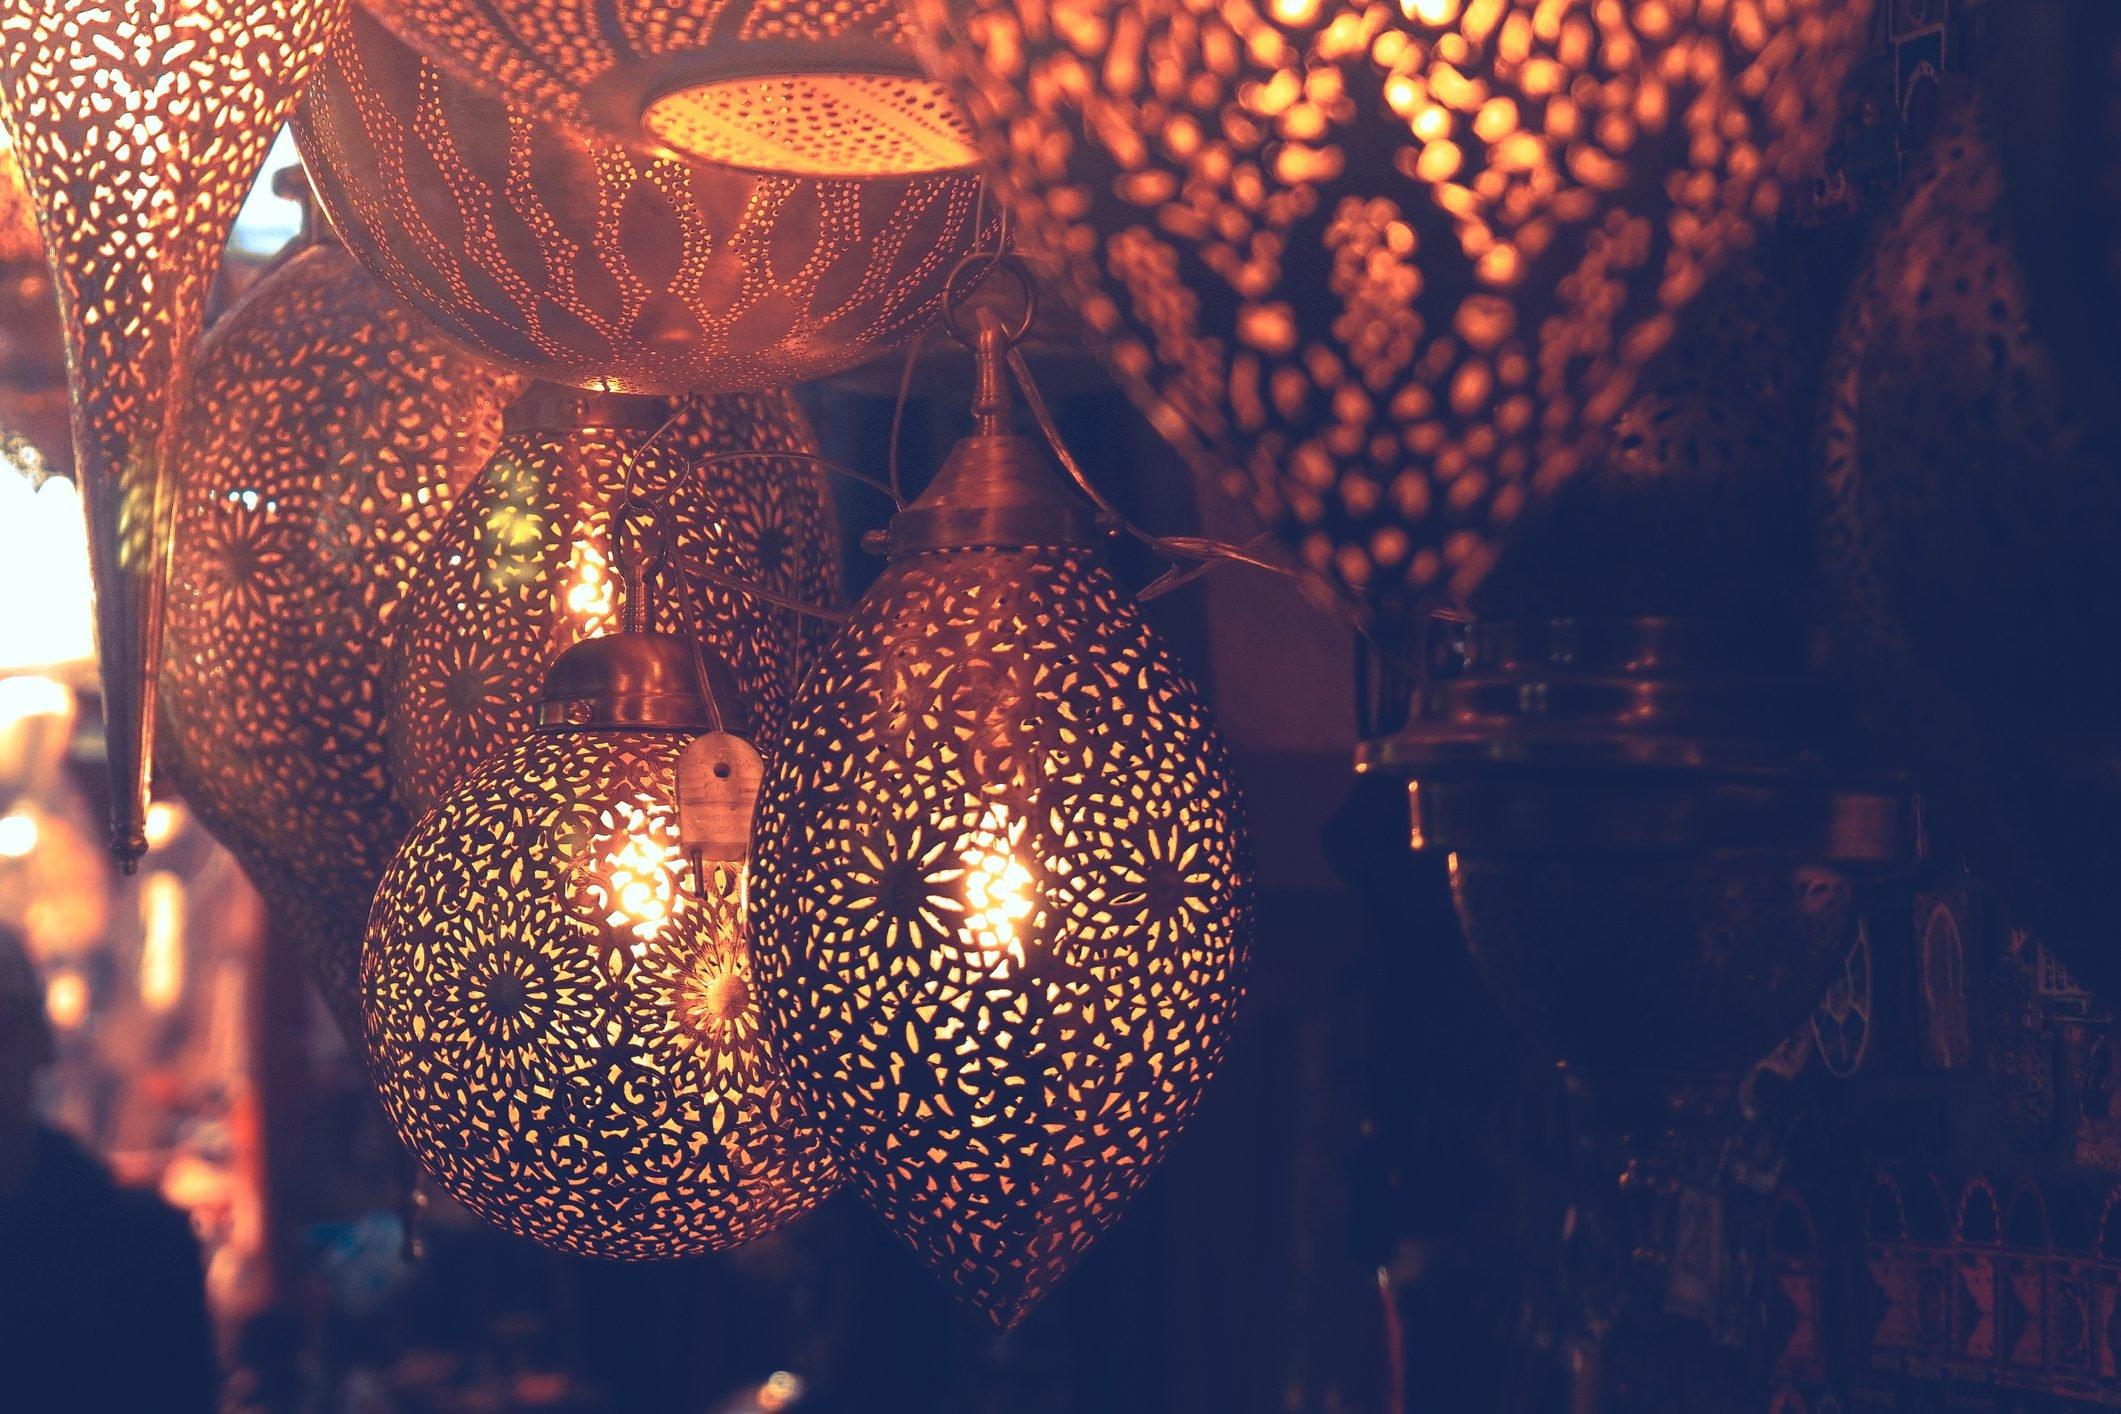 Metal lamps in souk, Marrakech, Morocco